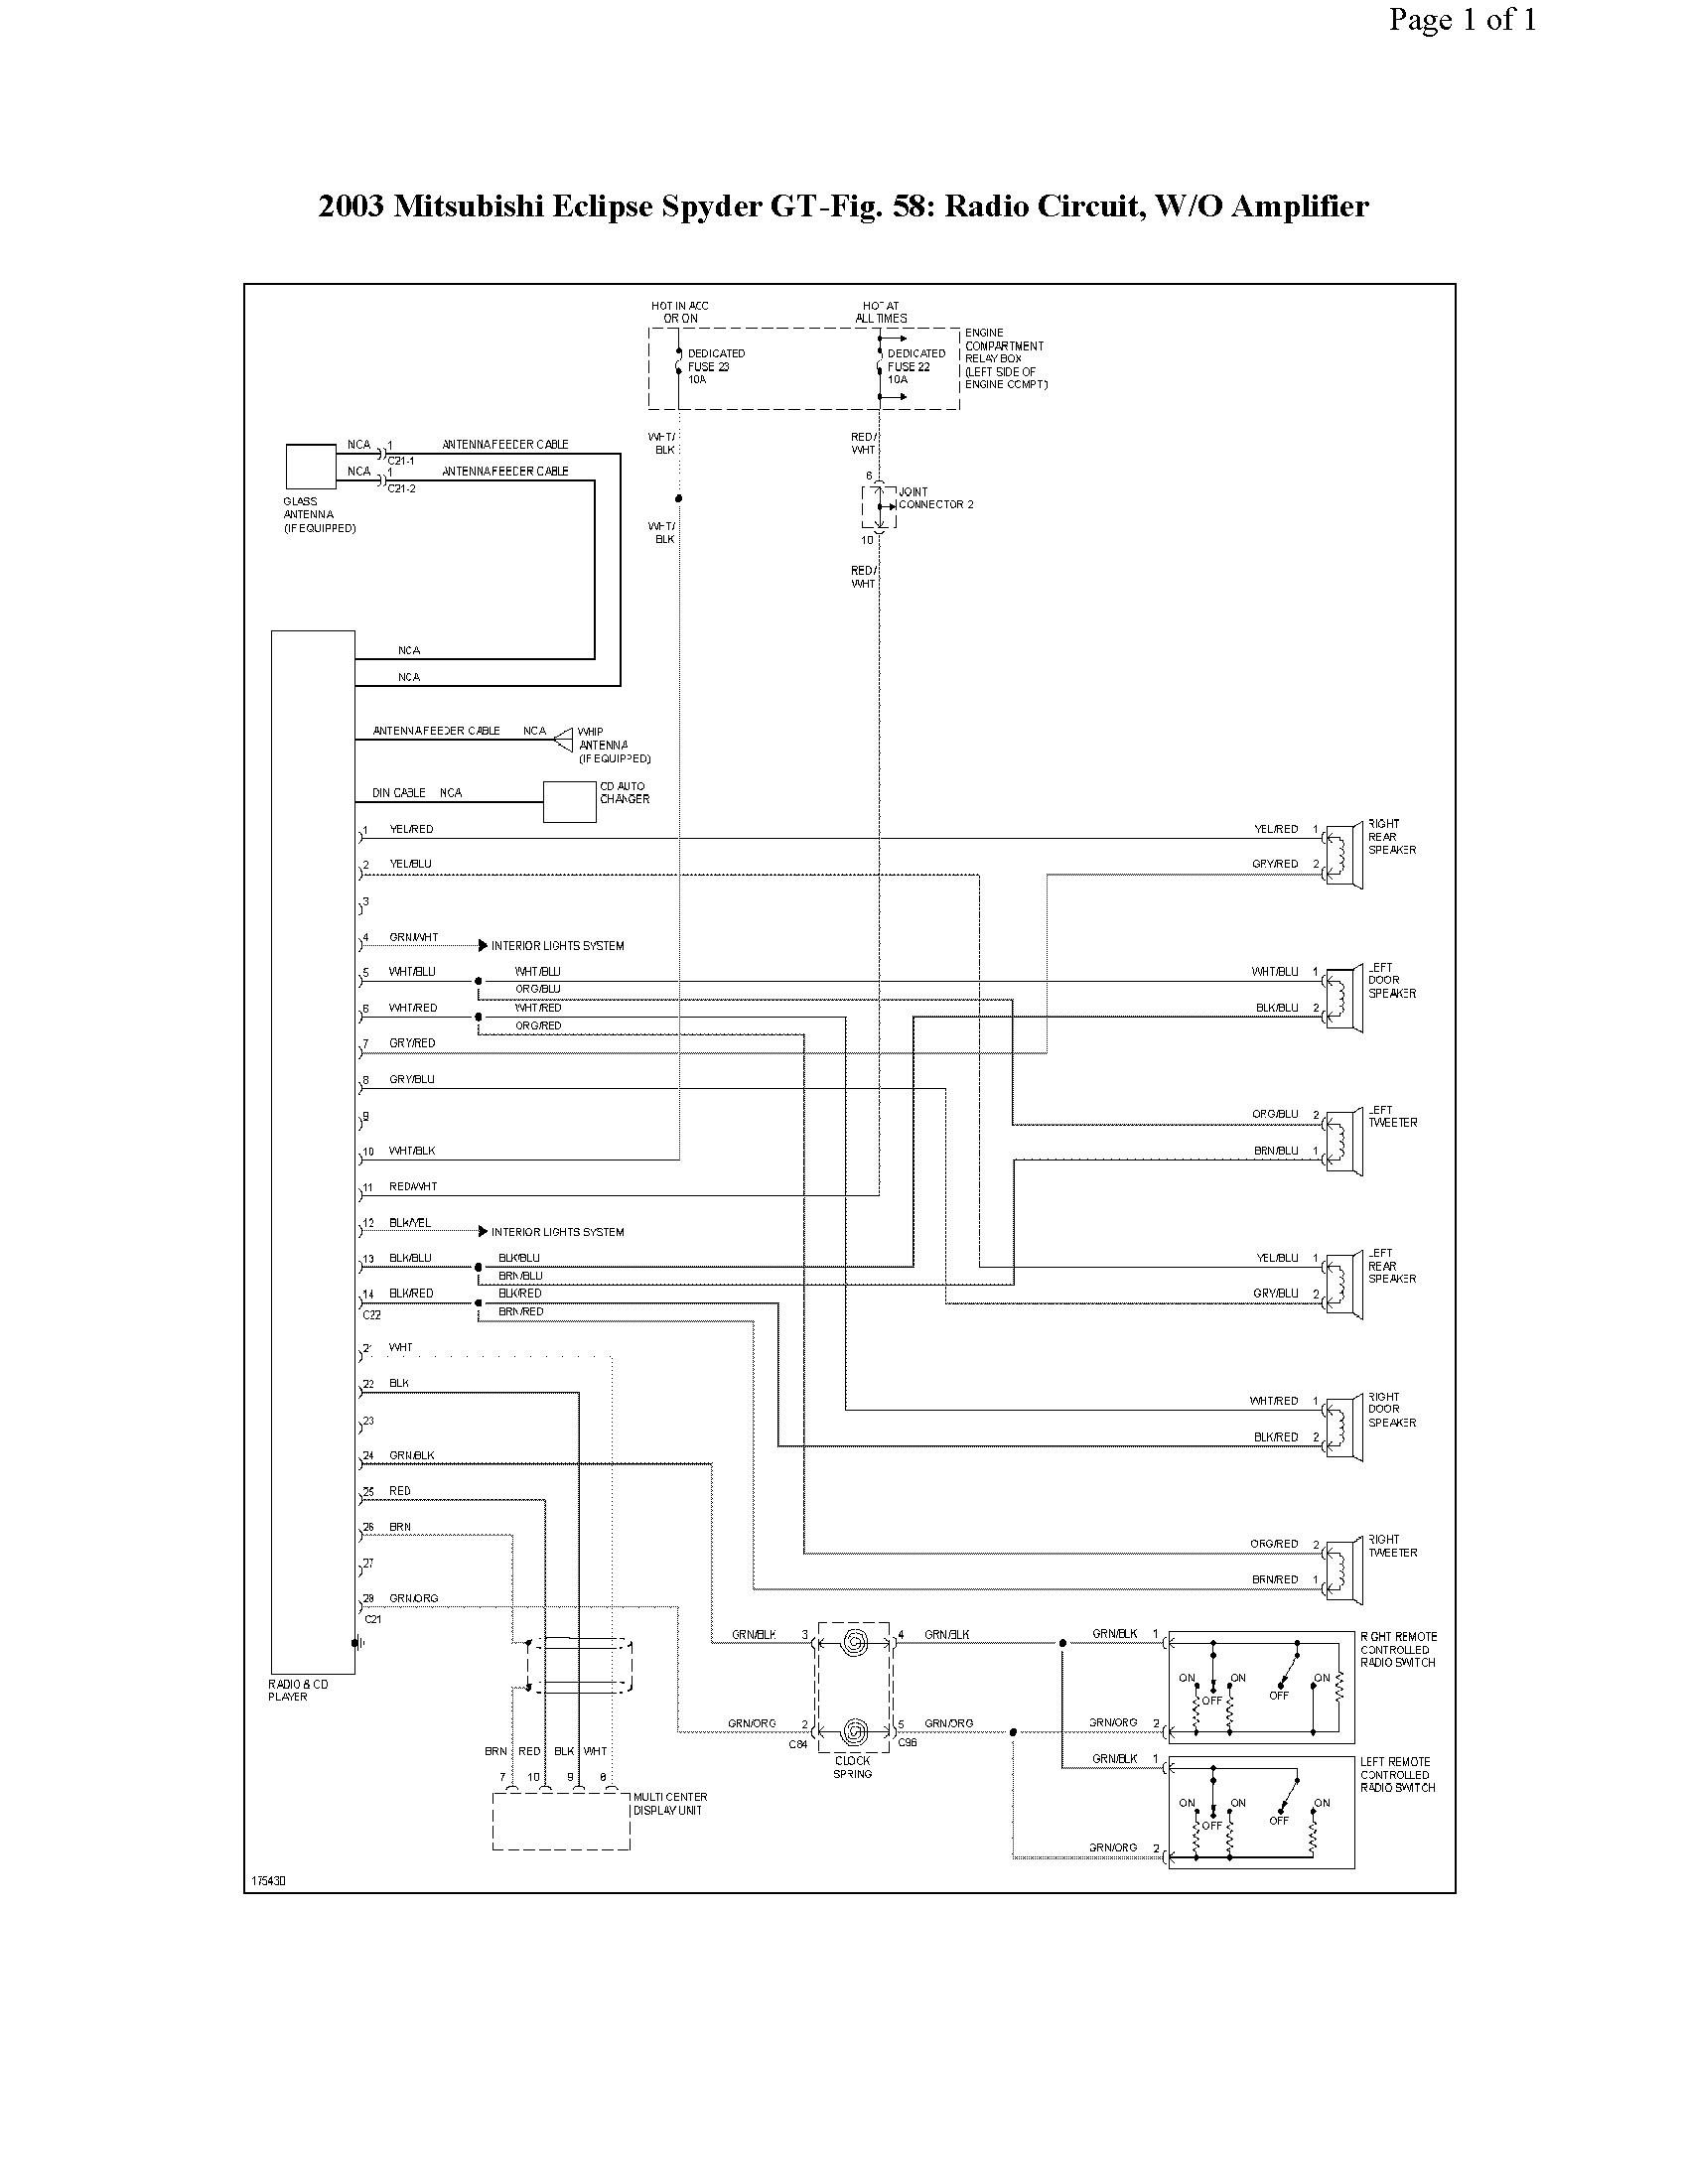 Diagram 2000 Mitsubishi Eclipse Wiring Diagram Speakers Full Version Hd Quality Diagram Speakers Ardiagram Nazionalebasketmagistrati It